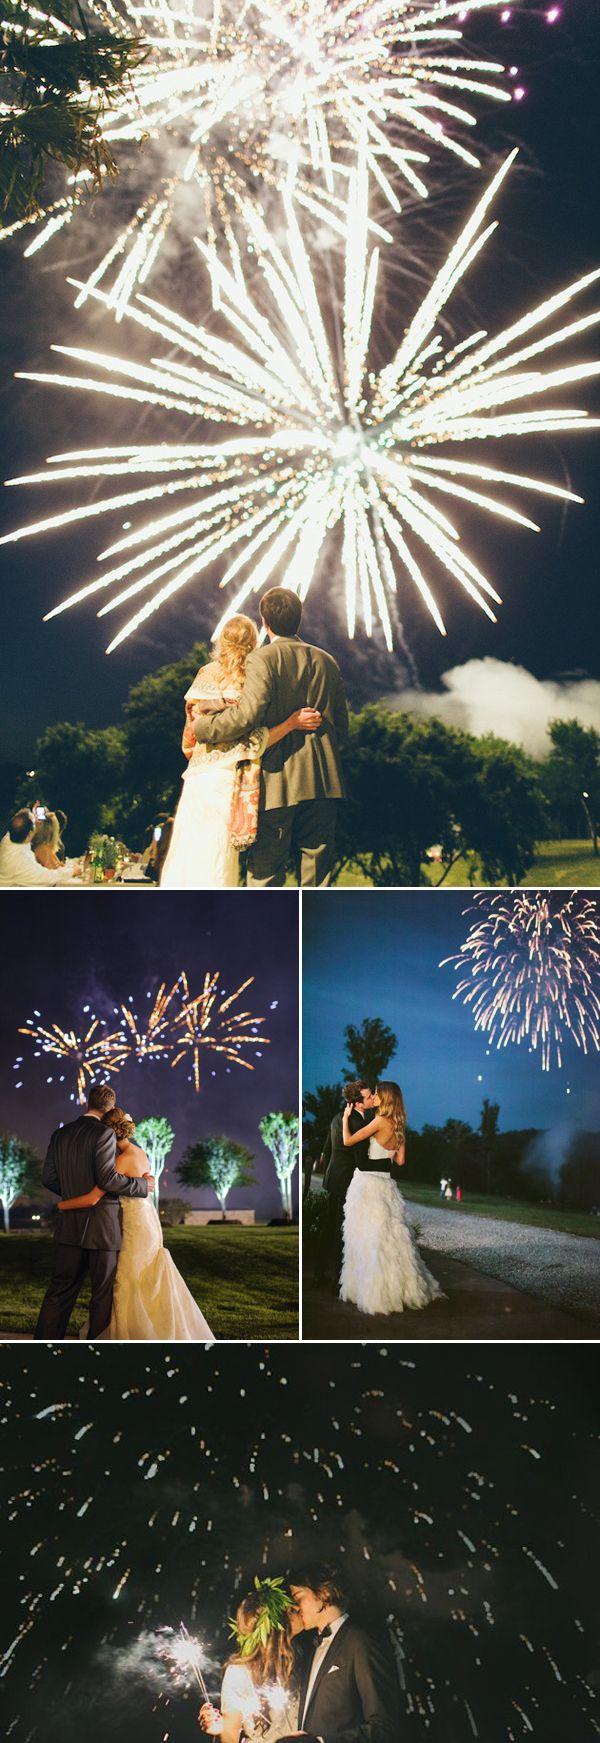 21 Cute New Year's Eve Couple Photo Ideas Wedding